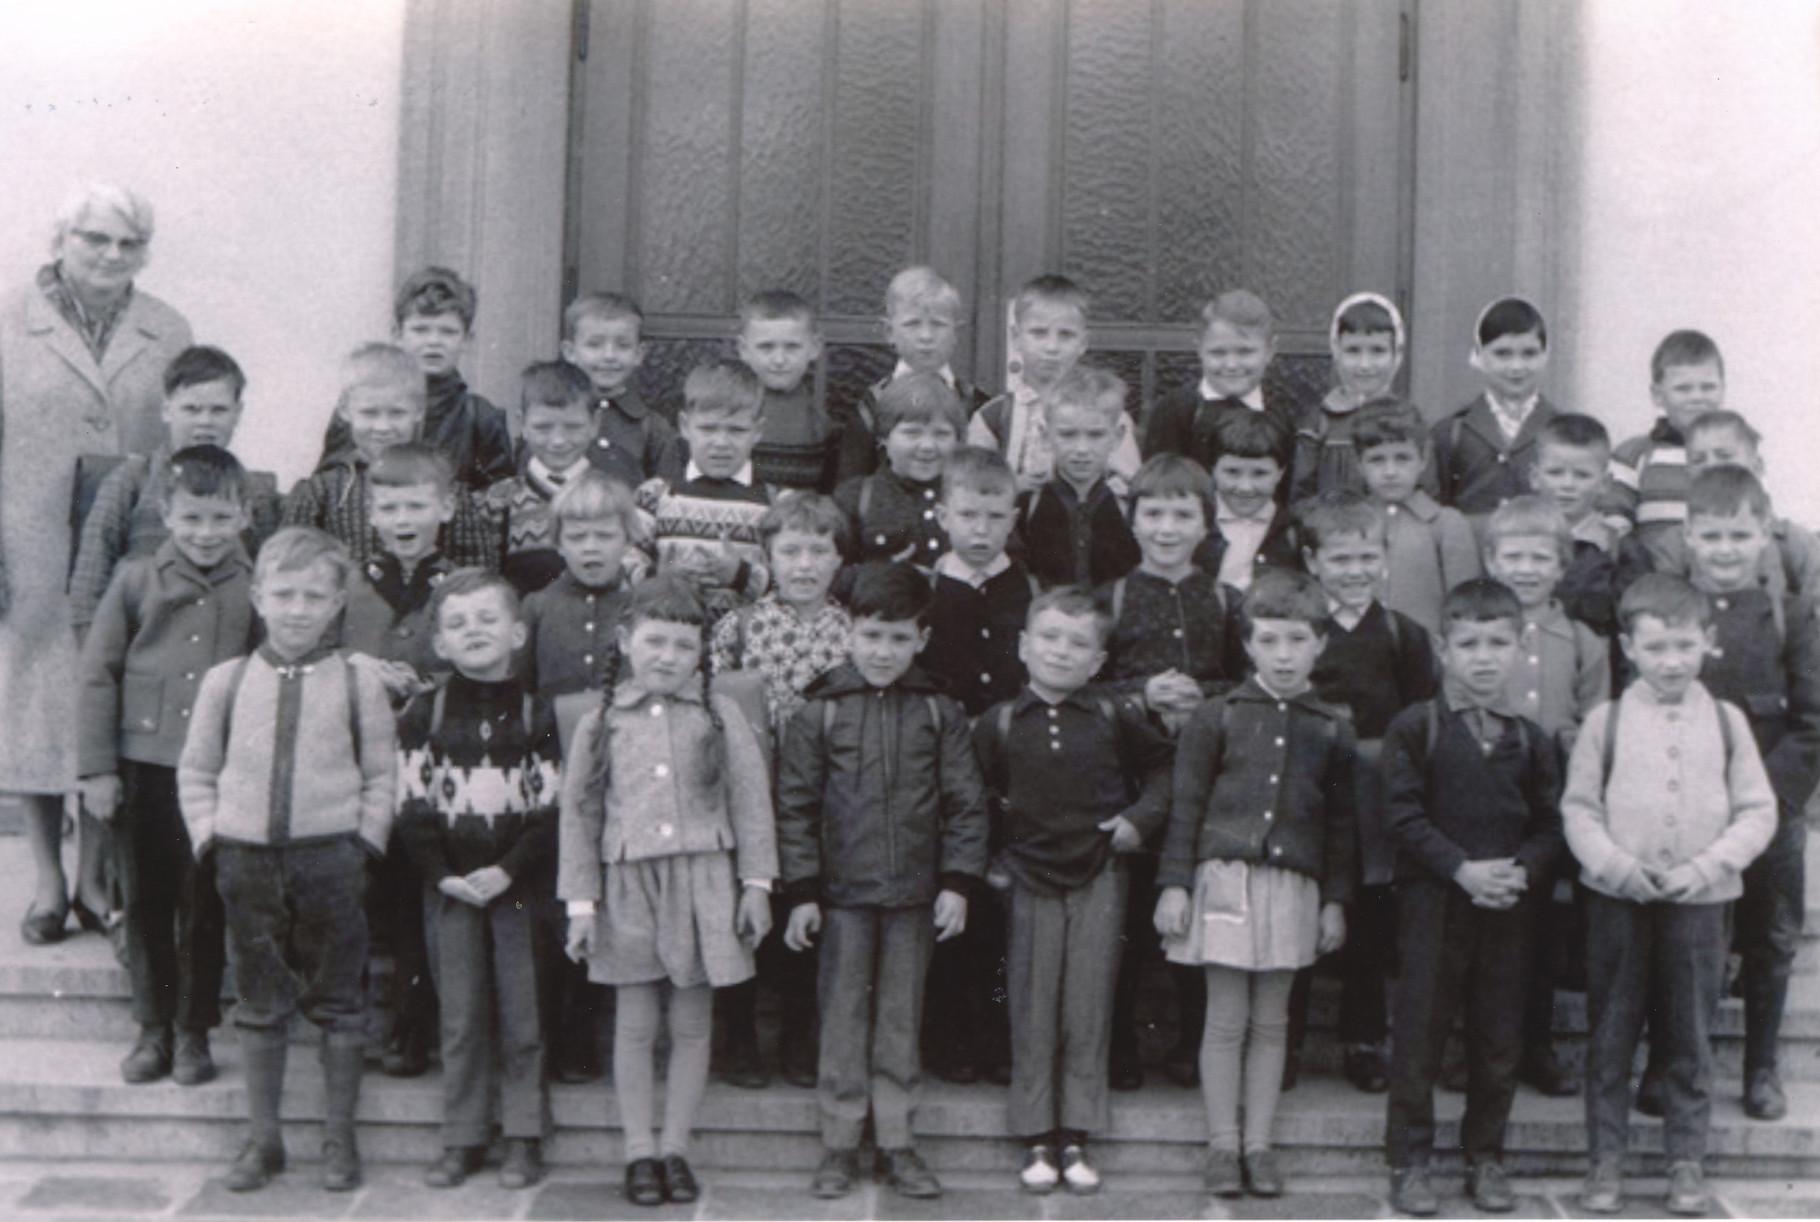 Jahrgang 1958, Bild: Dyhr, Holger